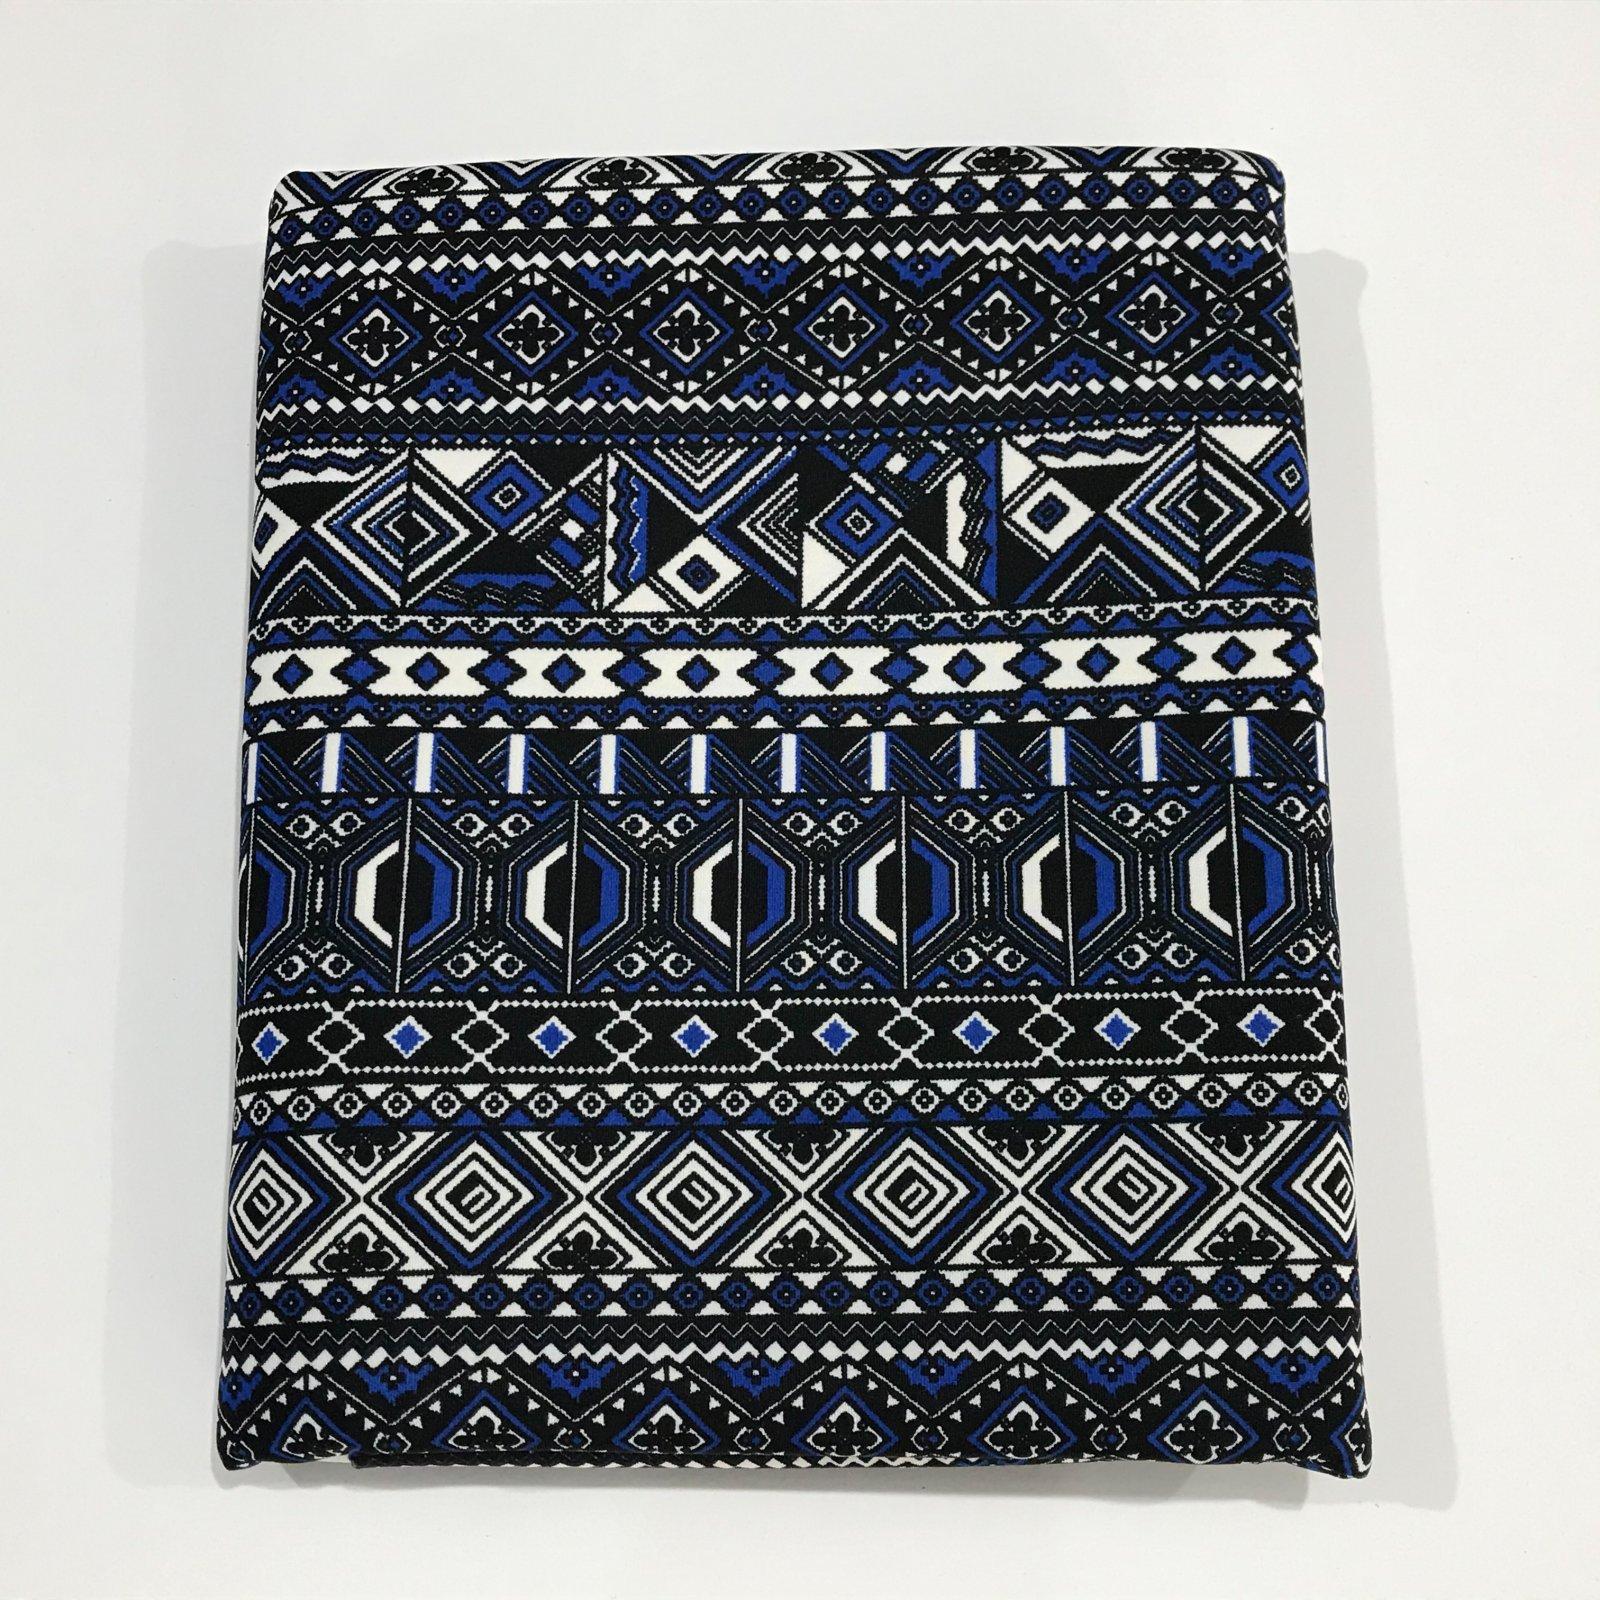 1 yard -  Ponte Knit - Mosaic Black and Blue